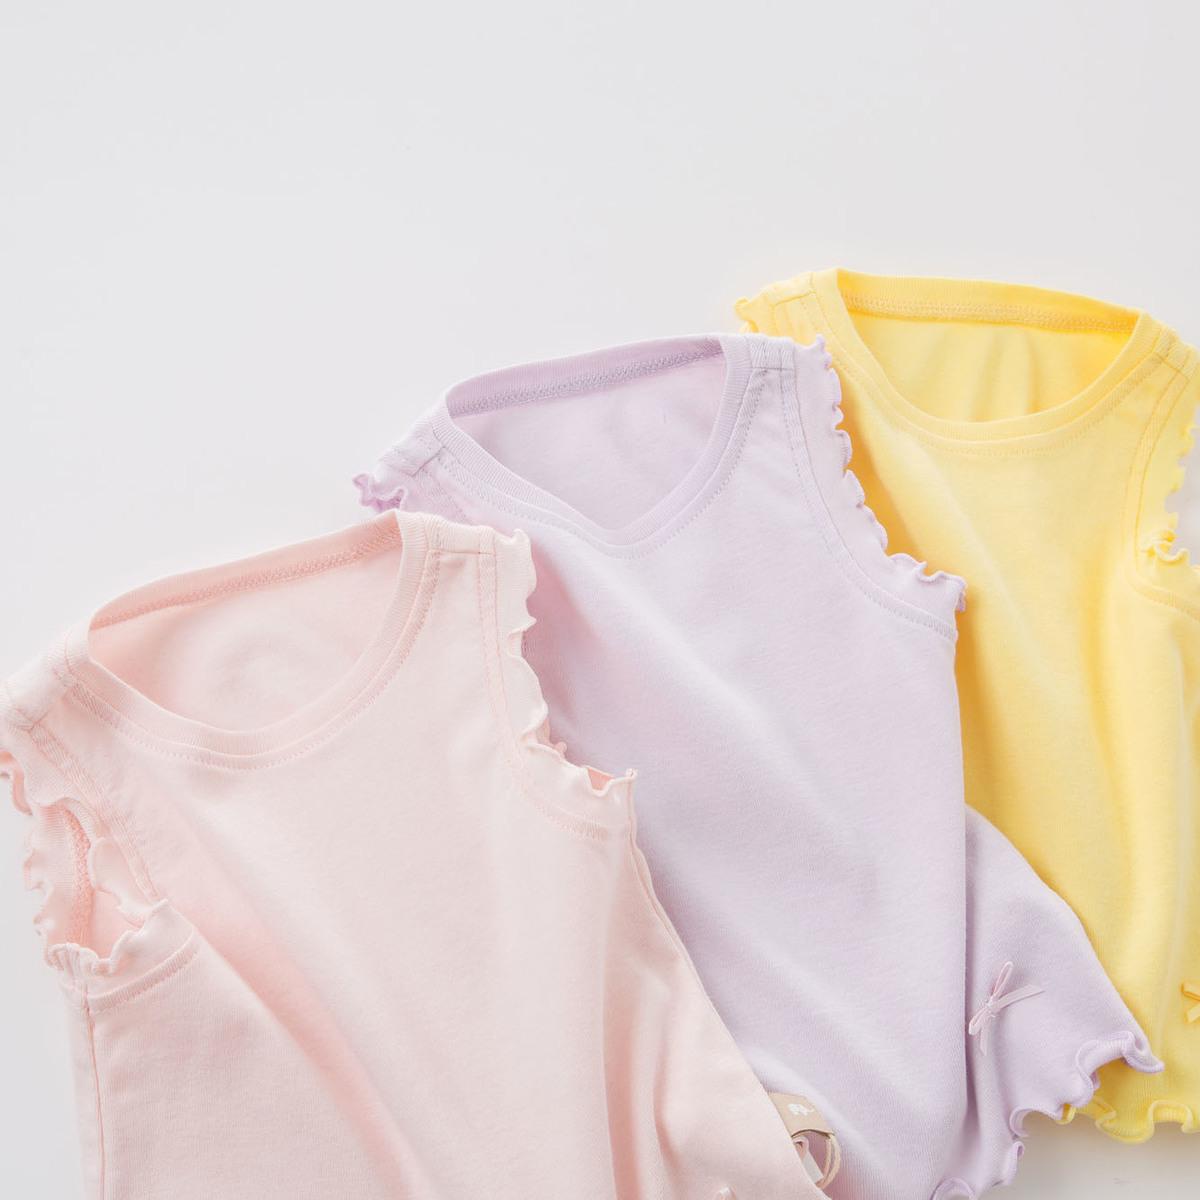 davebella戴维贝拉夏装新款女童背心 宝宝纯棉无袖上衣 3色DB7019